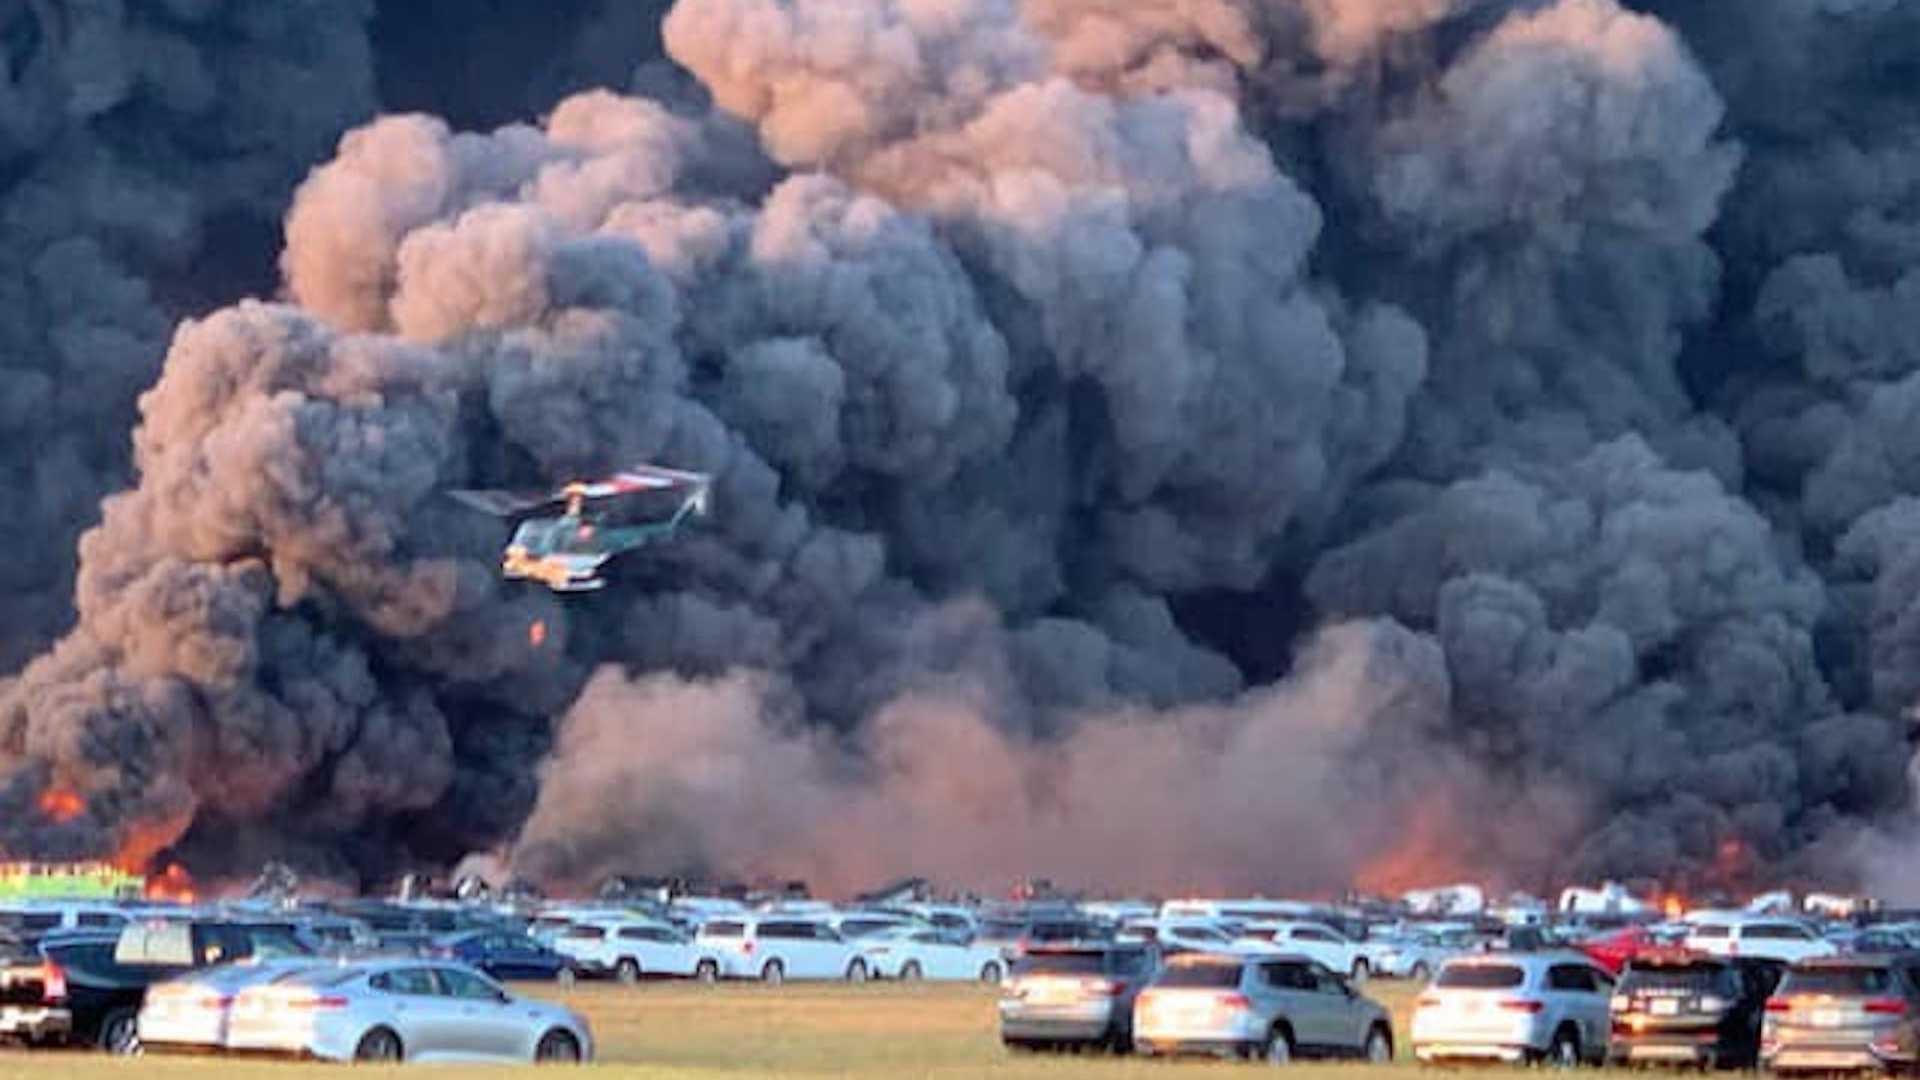 Fire_Florida_Airport_0000